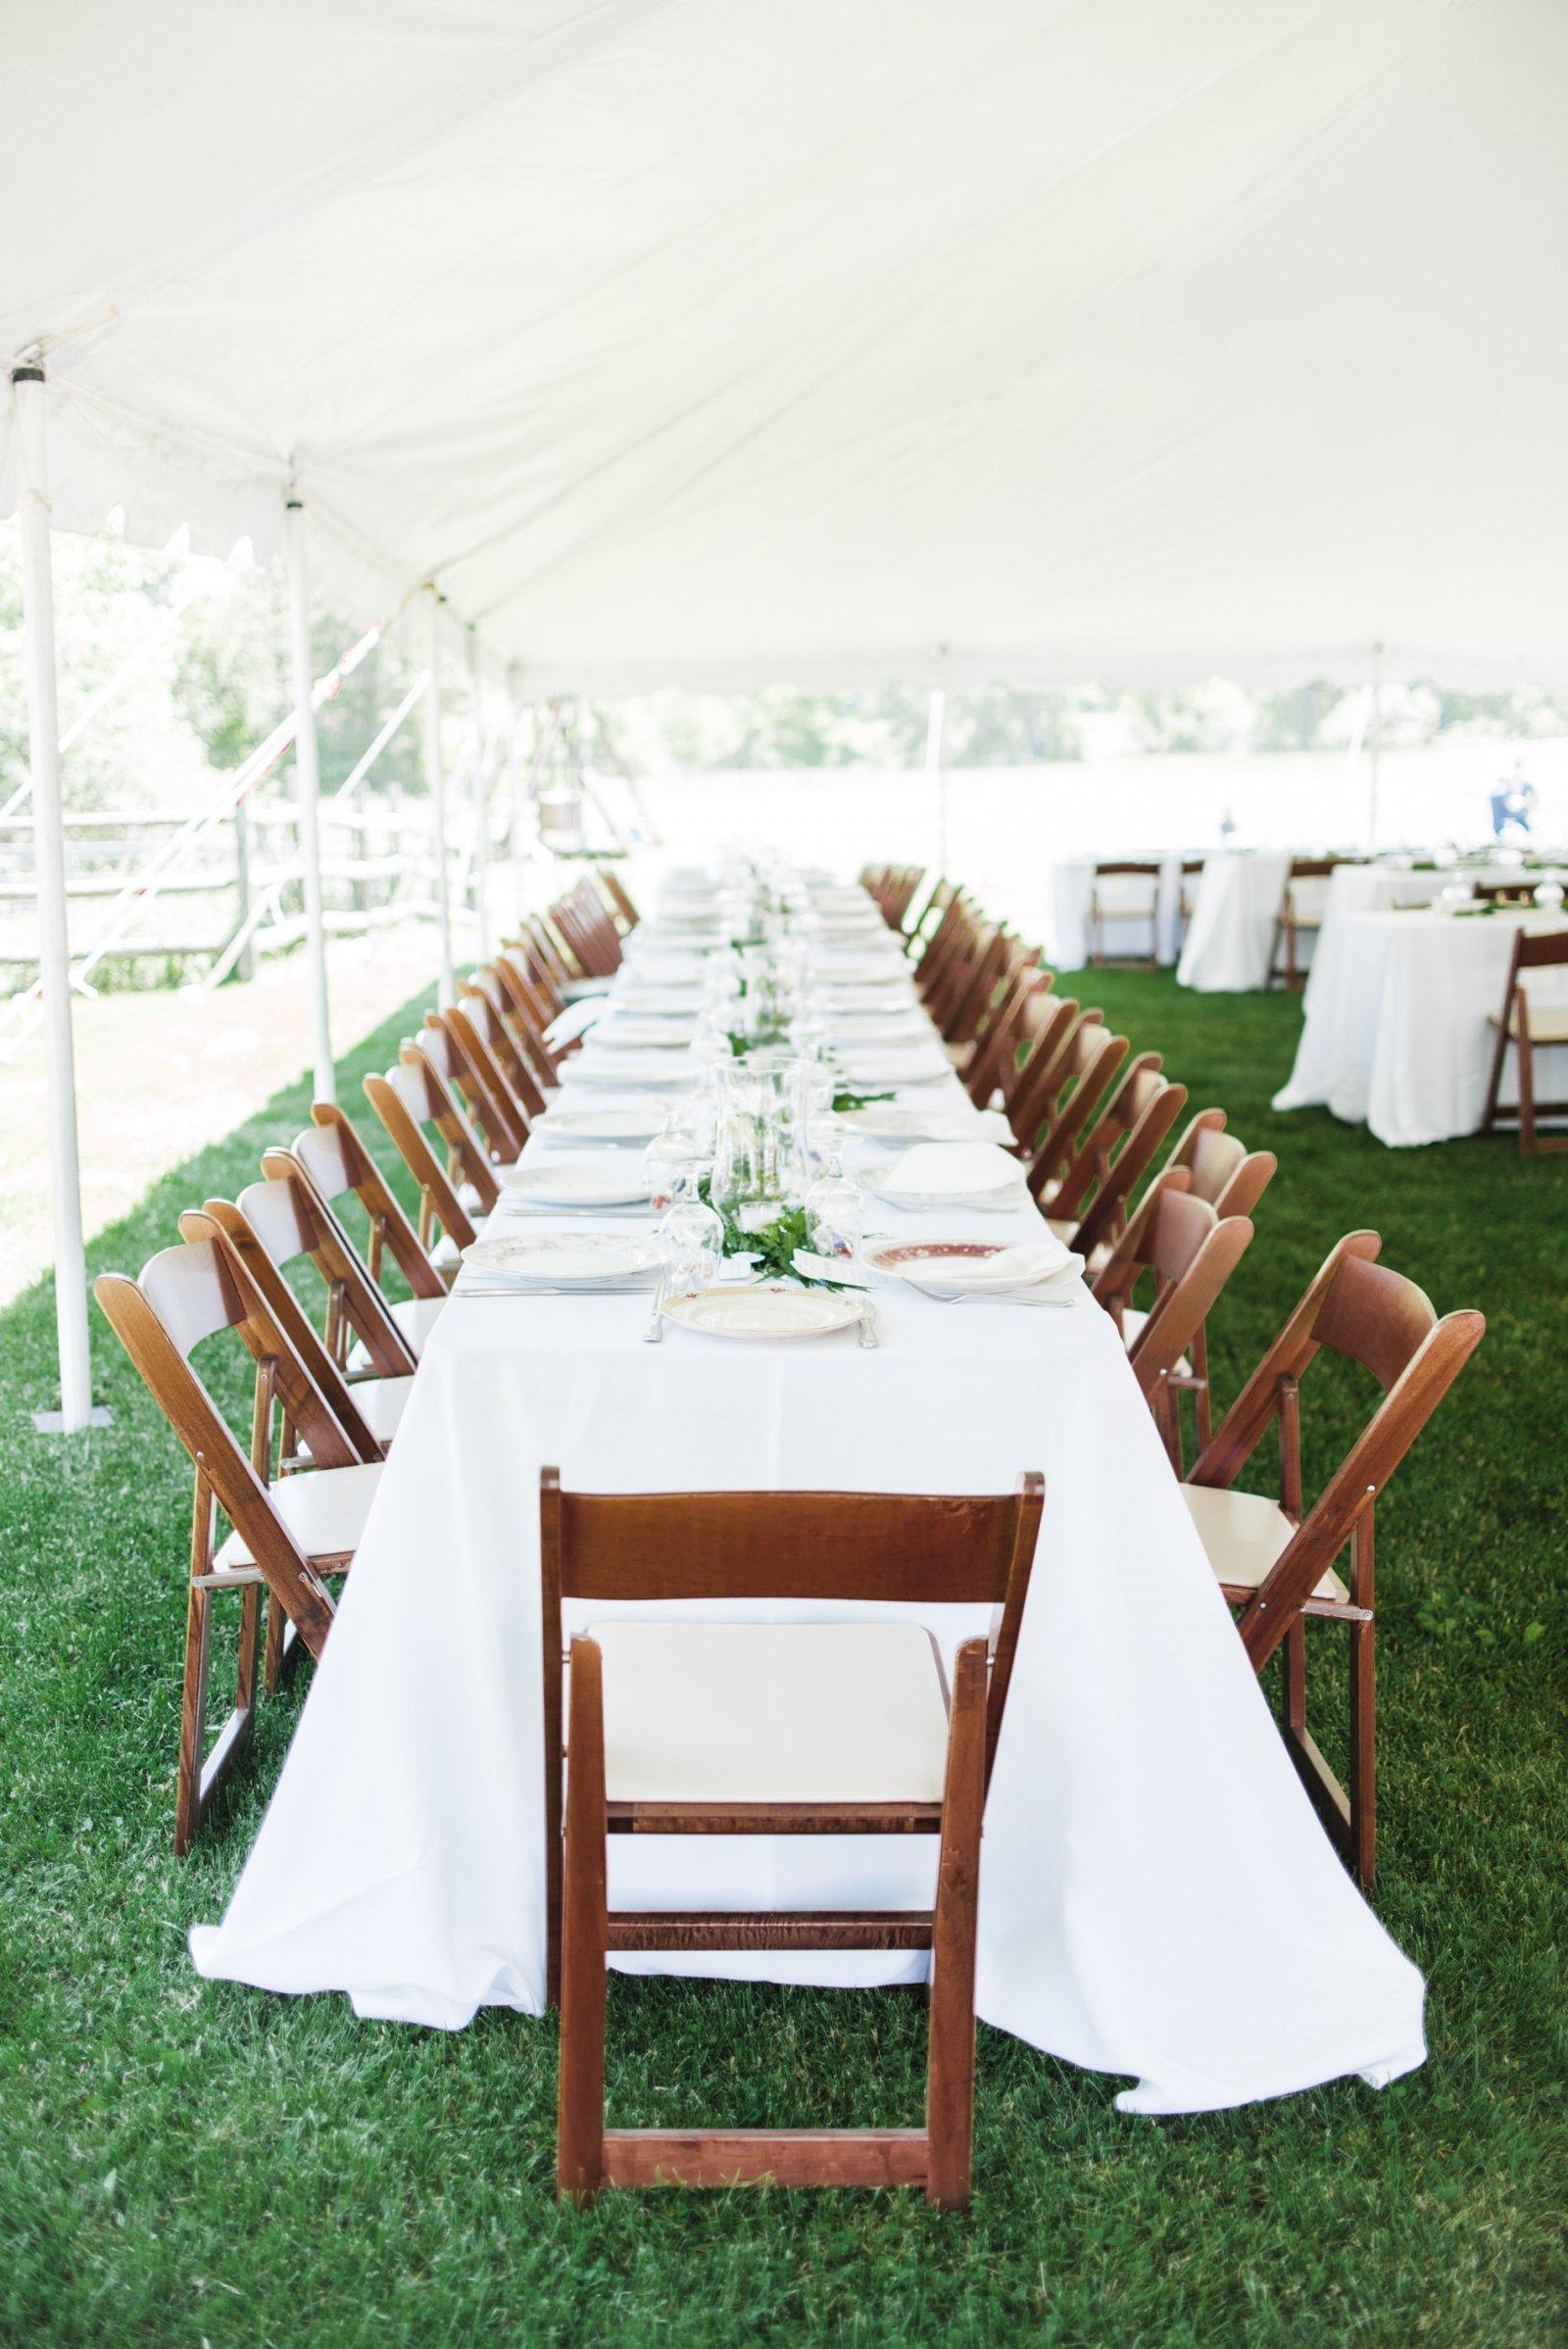 20170603_du_soleil_photographie_wedding_dana&steven_details-59